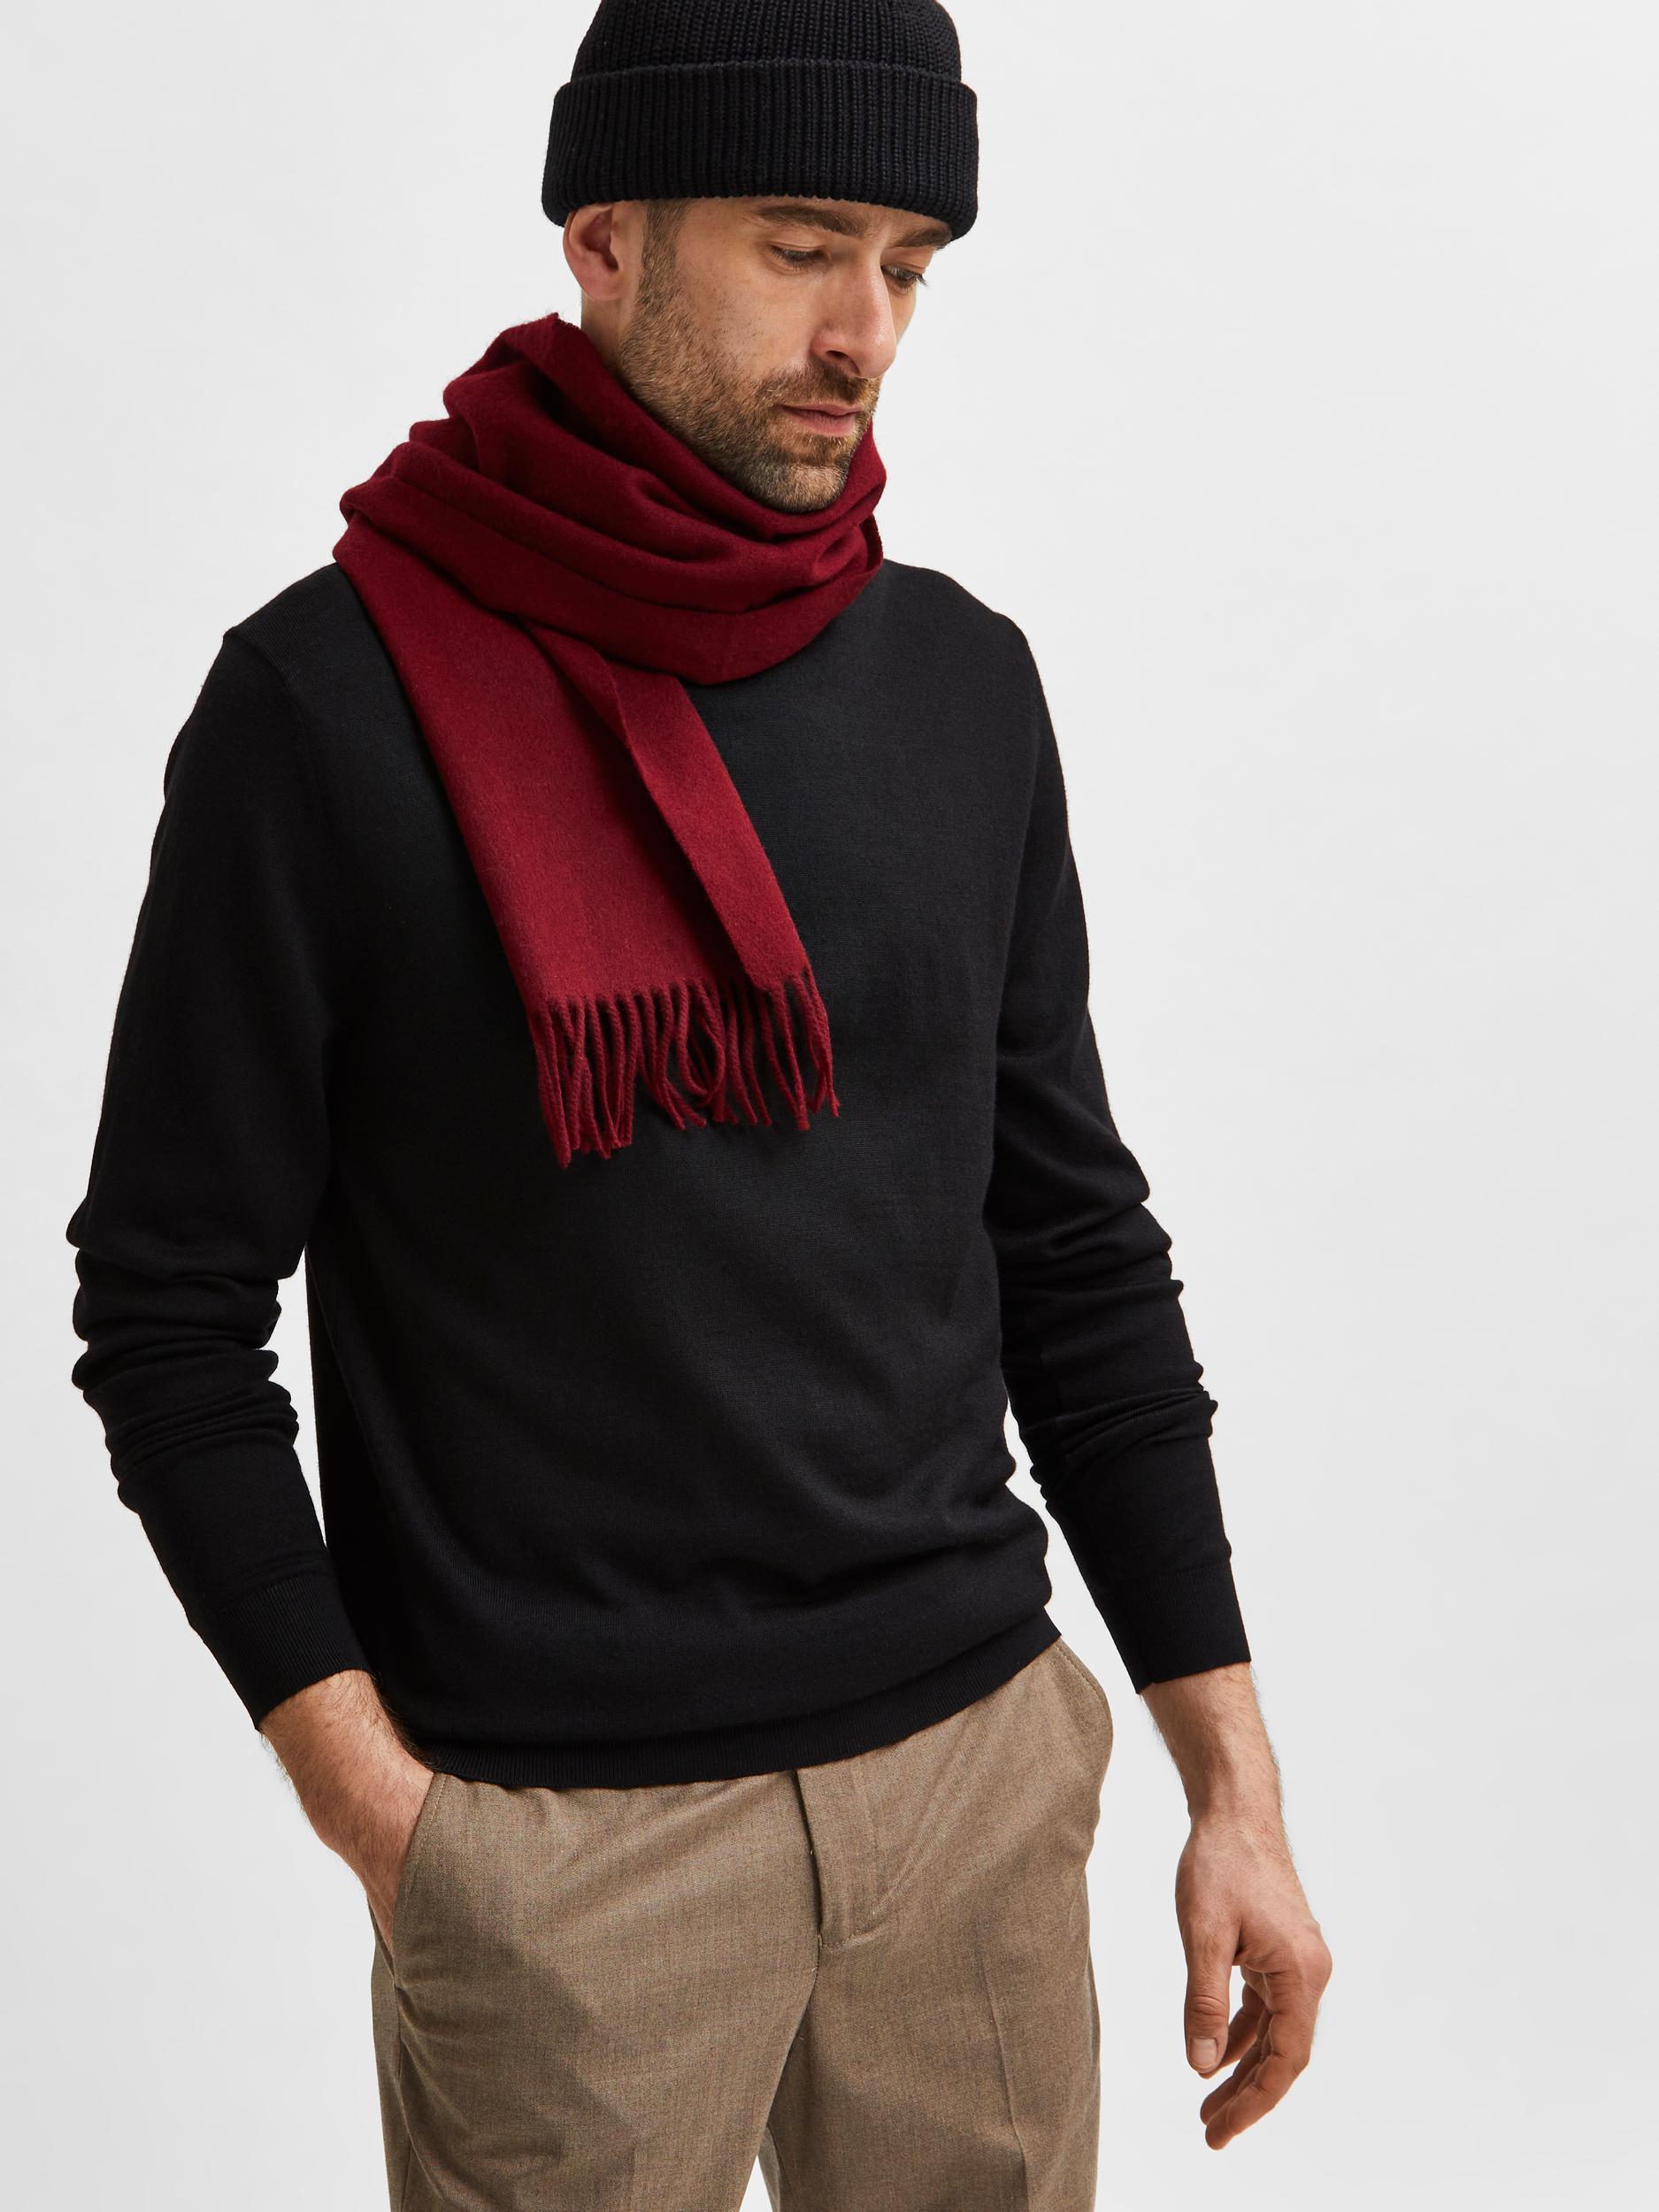 Selected Homme Town Merino LS trøje, black, medium